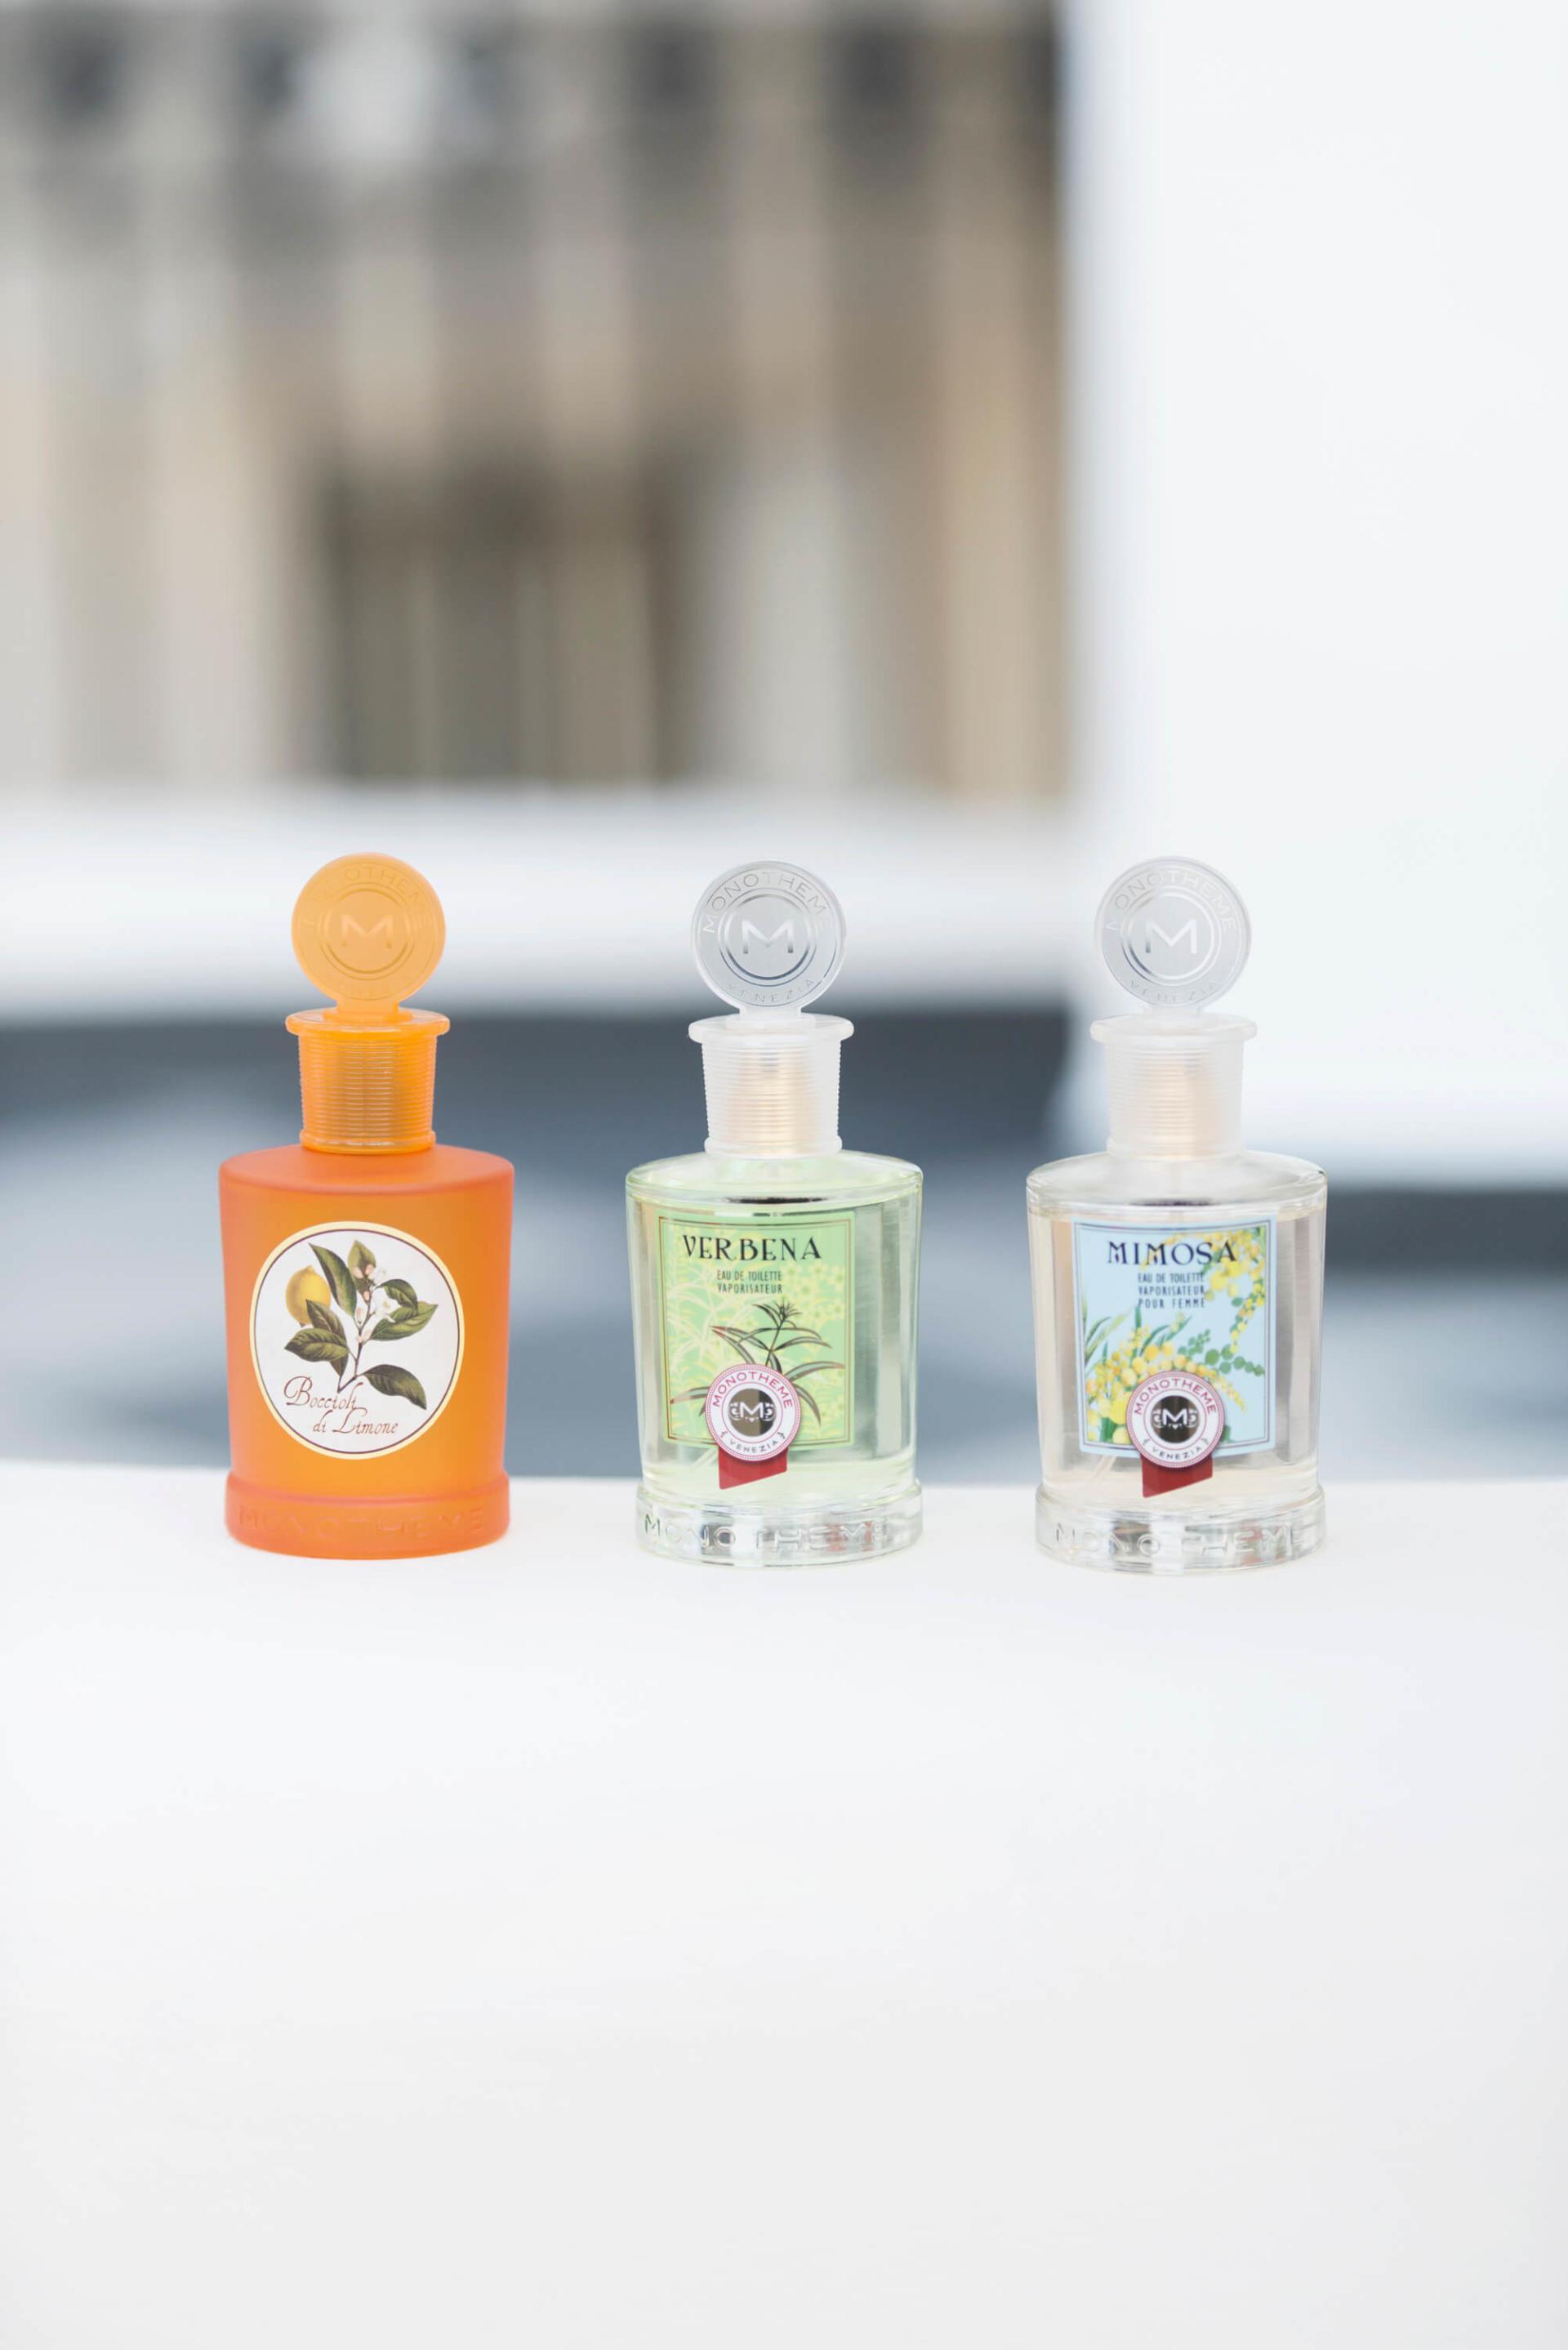 Monotheme Mimosa fragrance review